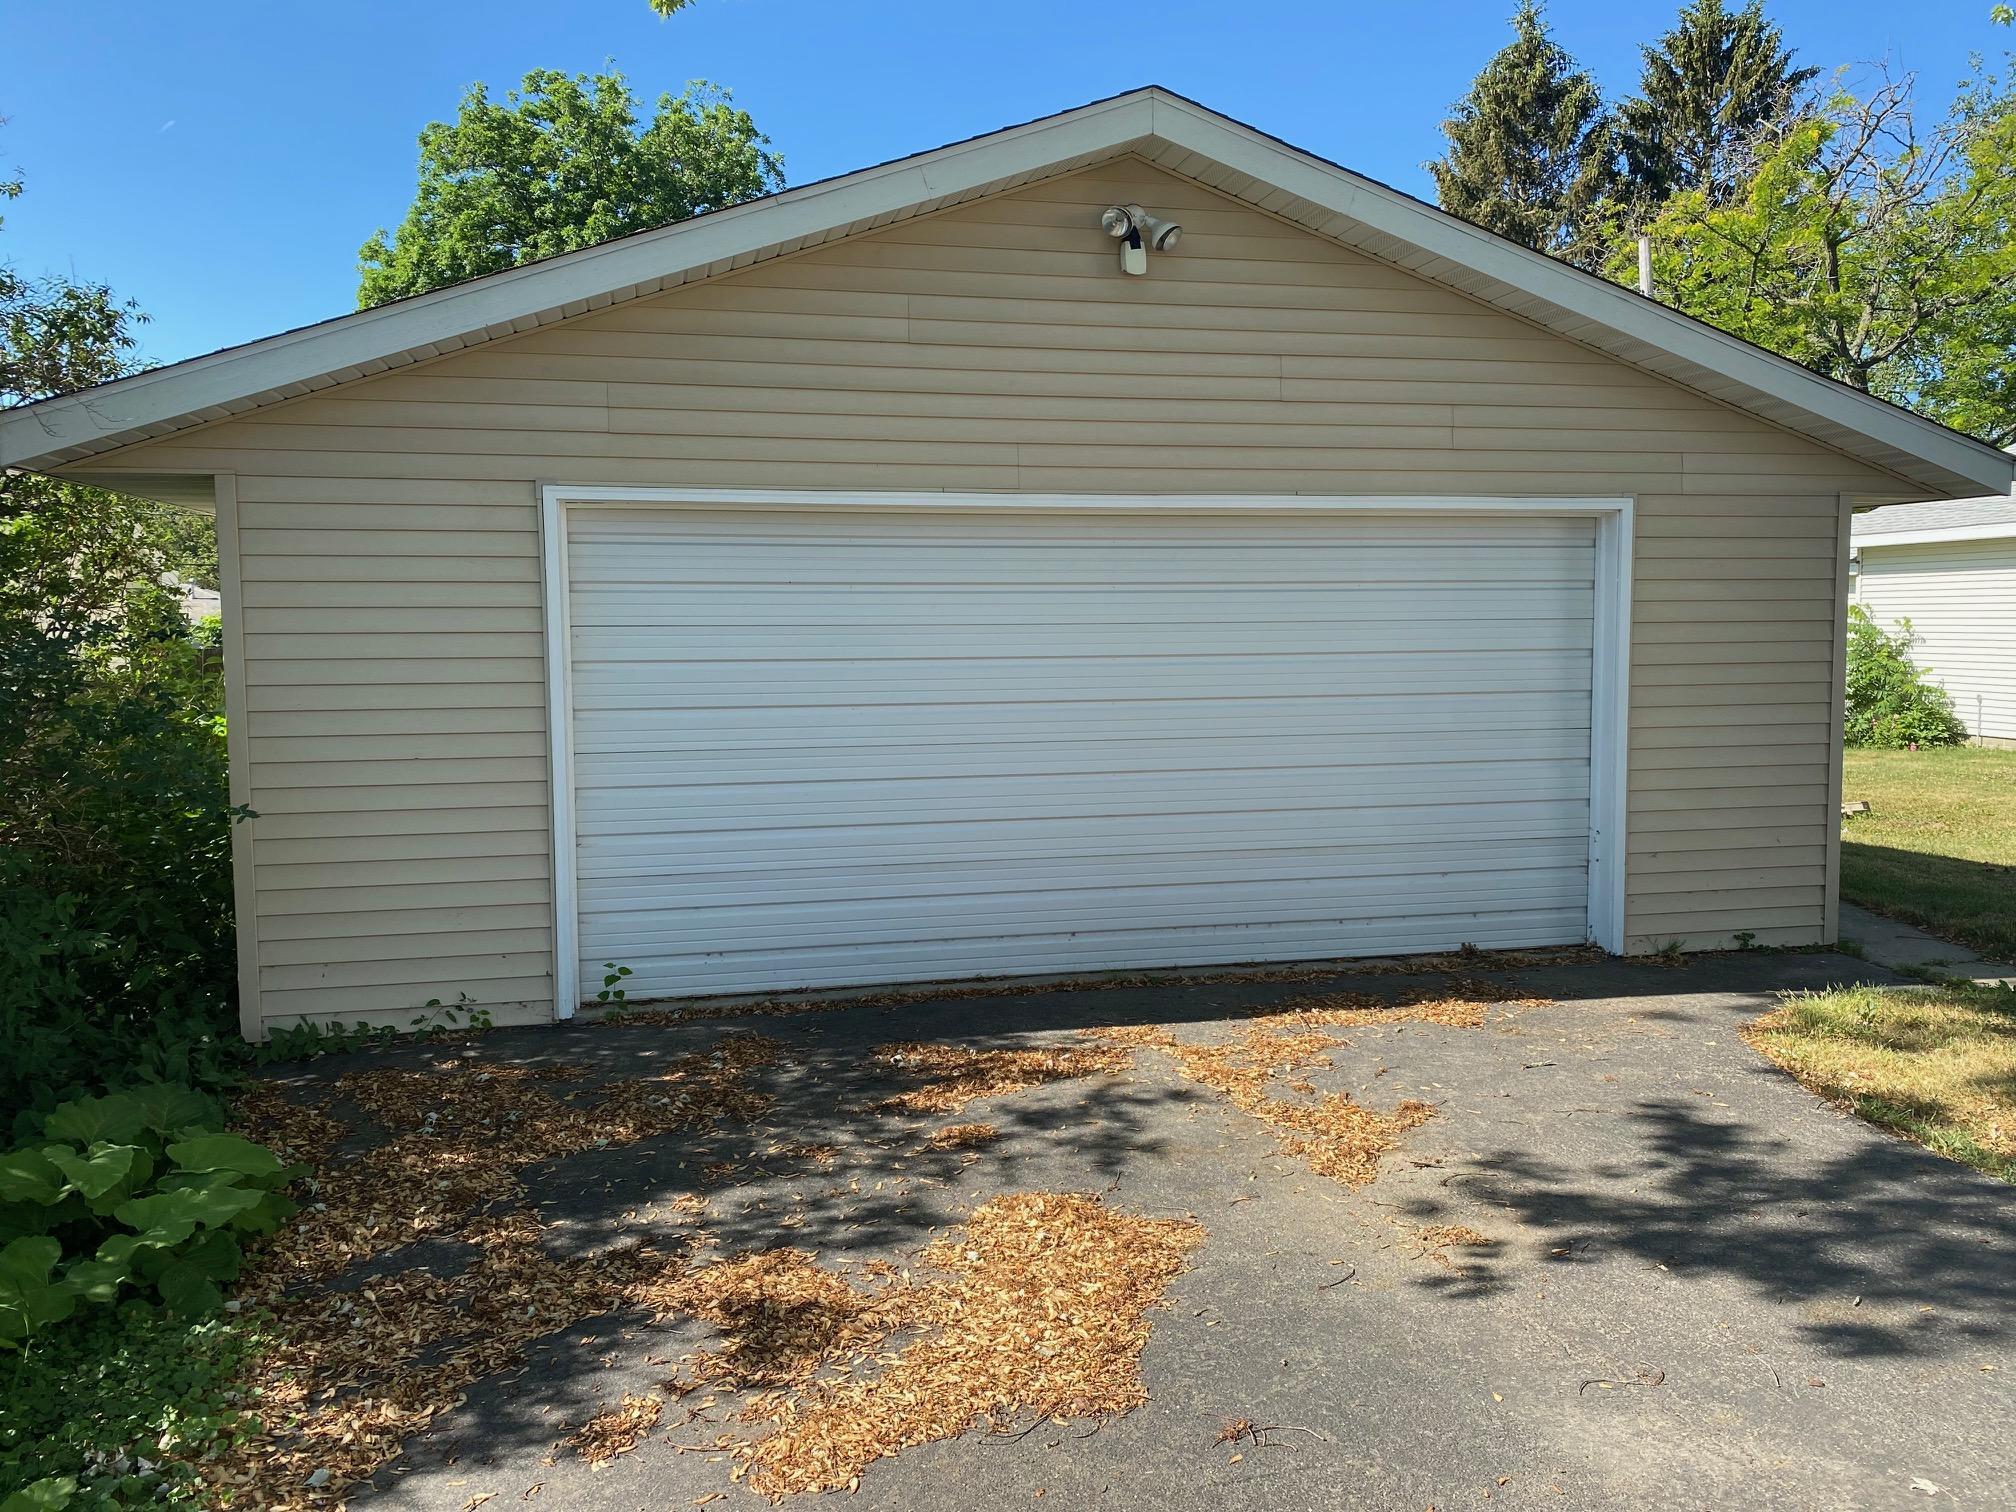 Detached 2 car garage